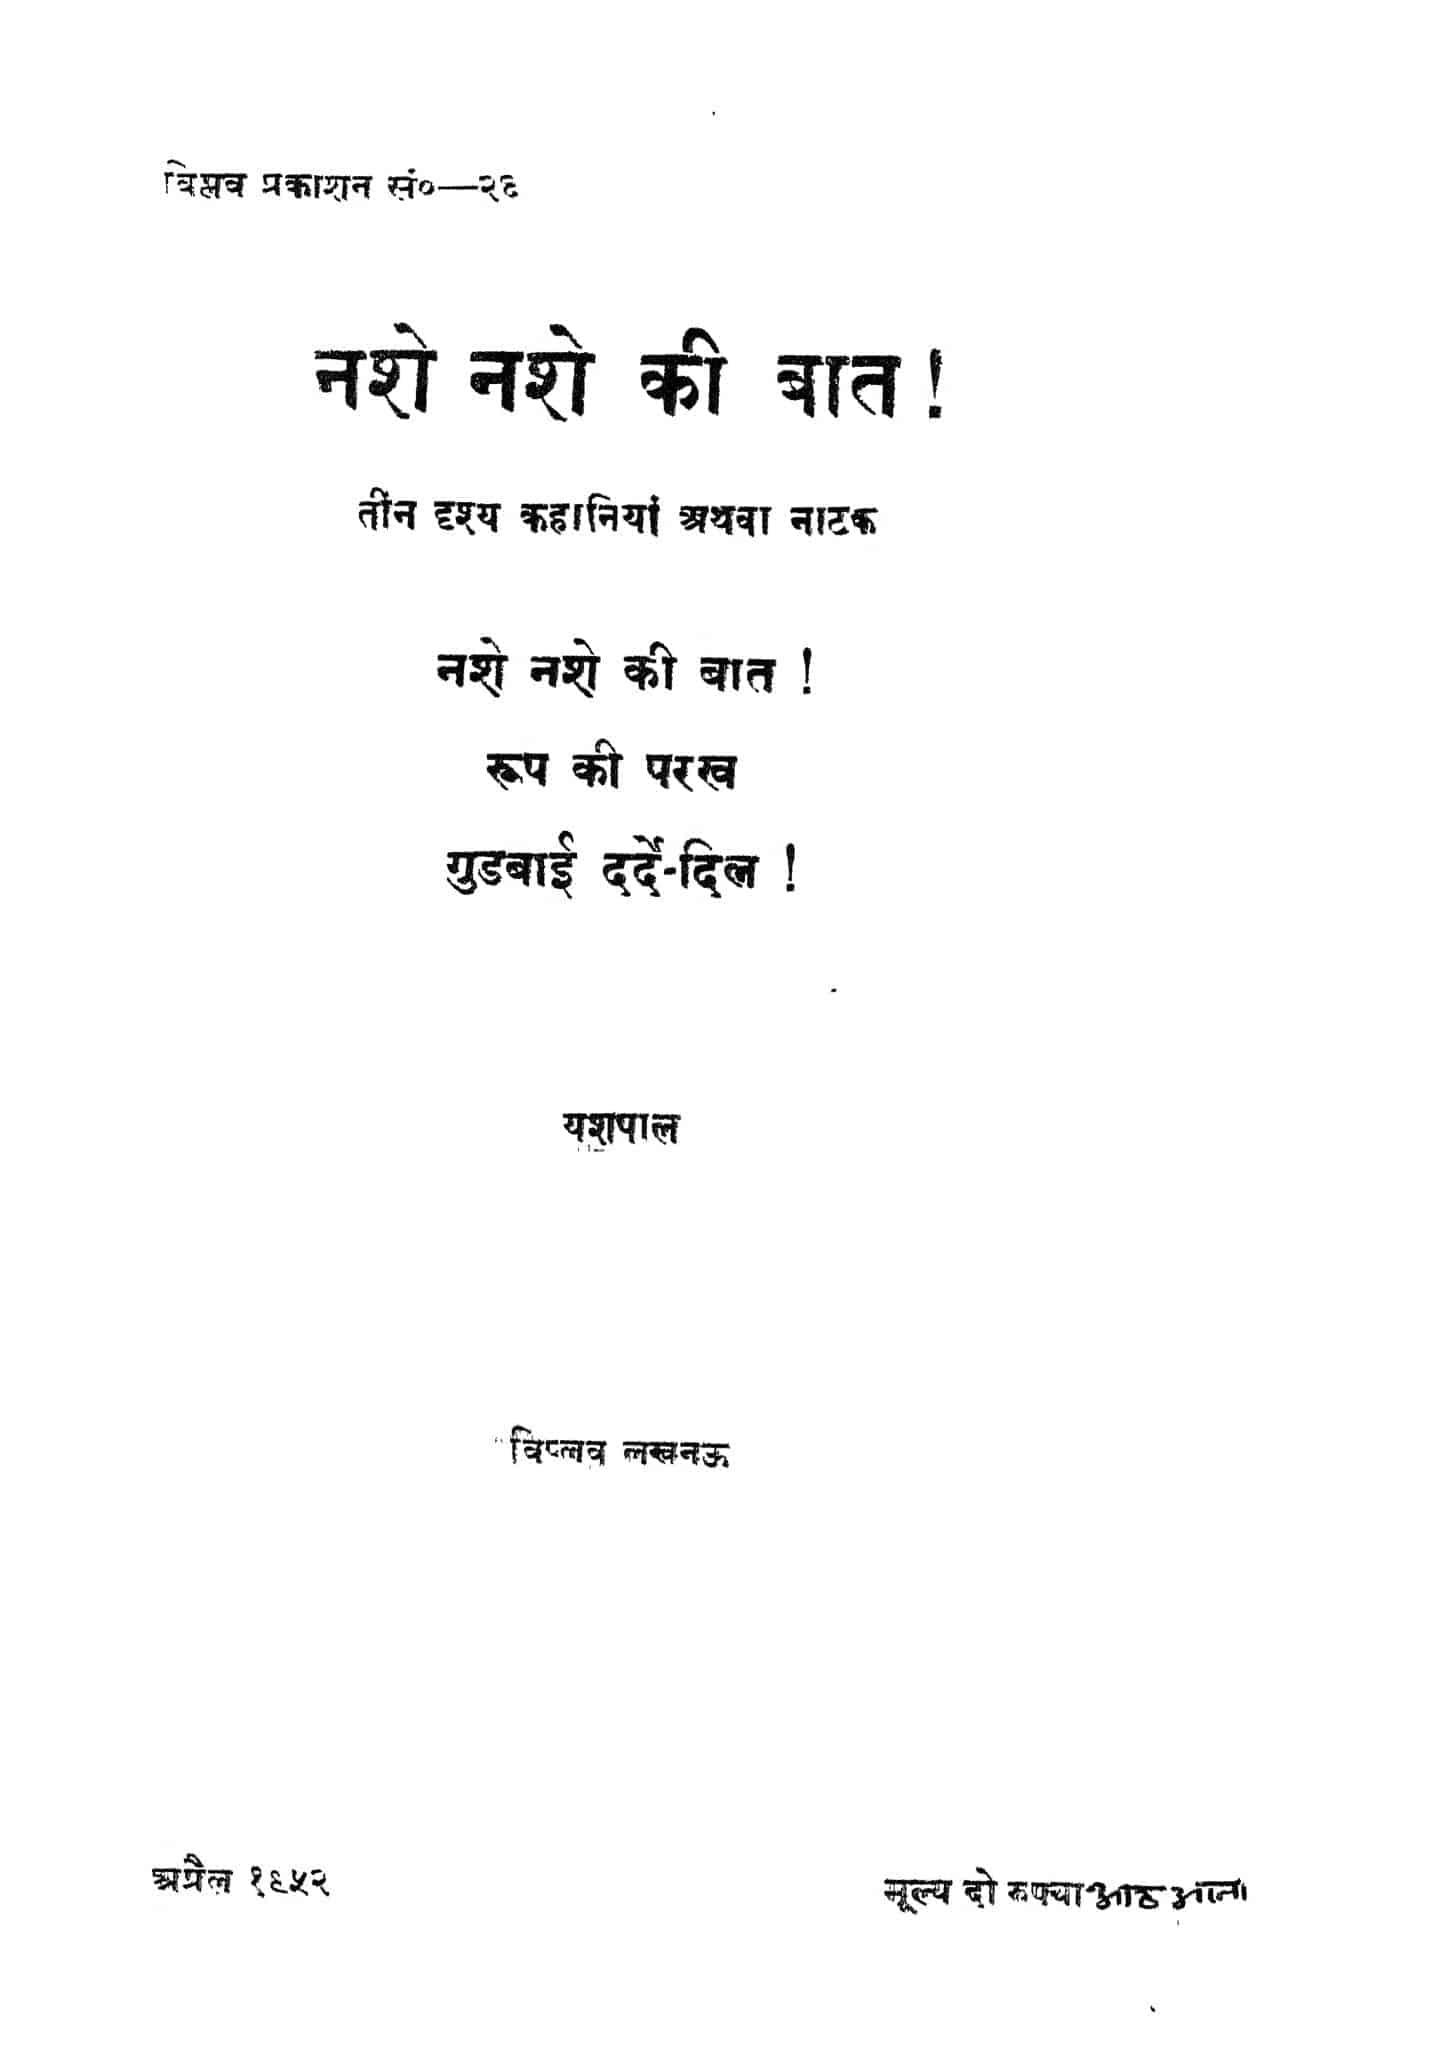 Nashe Nashe Ki Baat by यशपाल - Yashpal